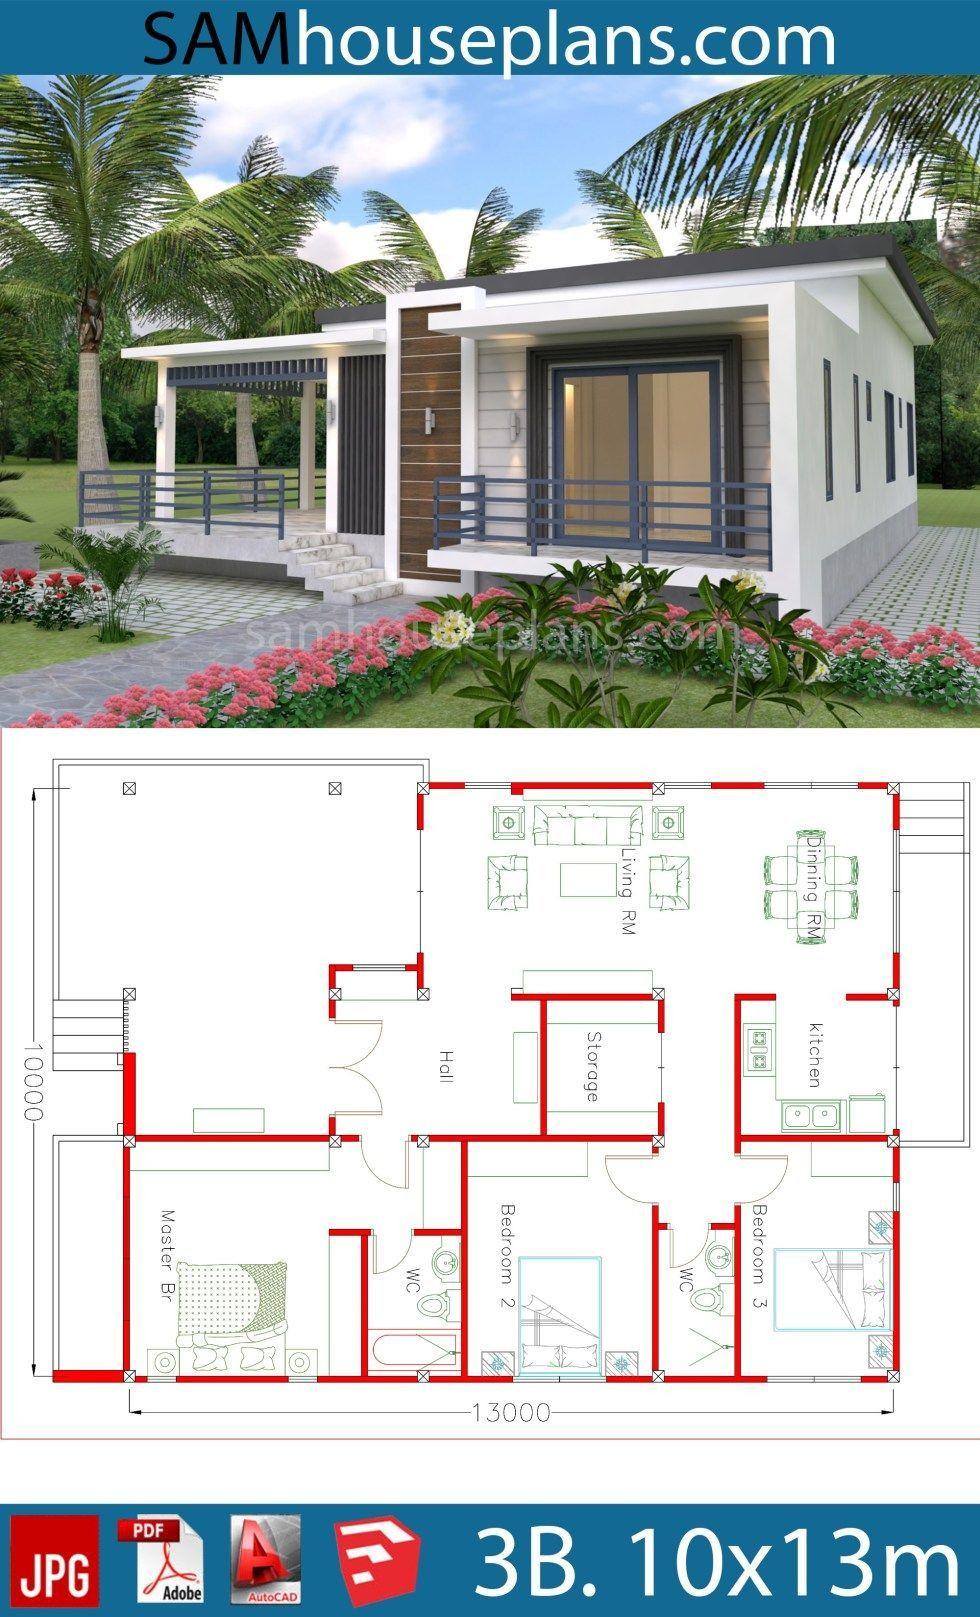 Simple Modern House Plans Photos 2020 Rumah Indah Kehidupan Rumah Mungil Arsitektur Modern